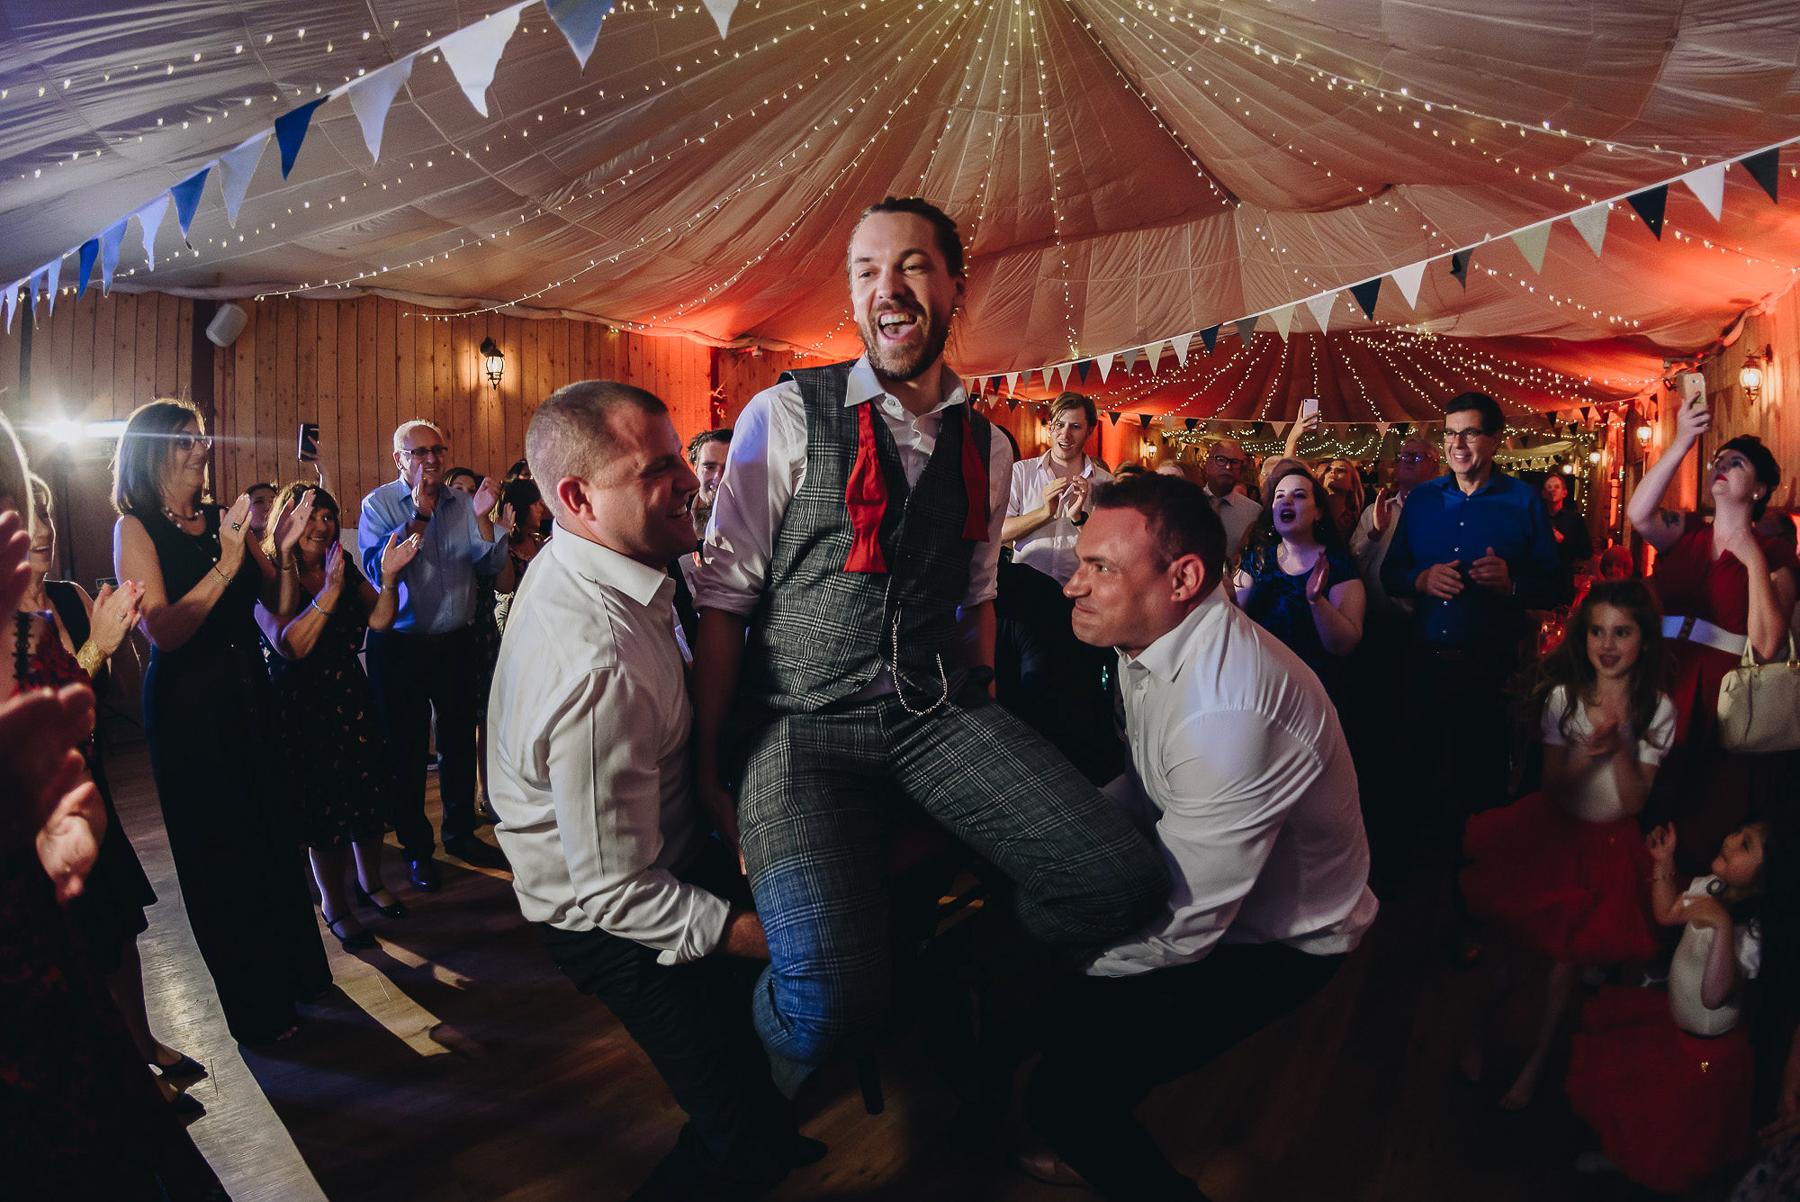 Wellbeing_Farm_Wedding_Photography_The_Pin-Up_Bride_Lara_Shaun-171.jpg